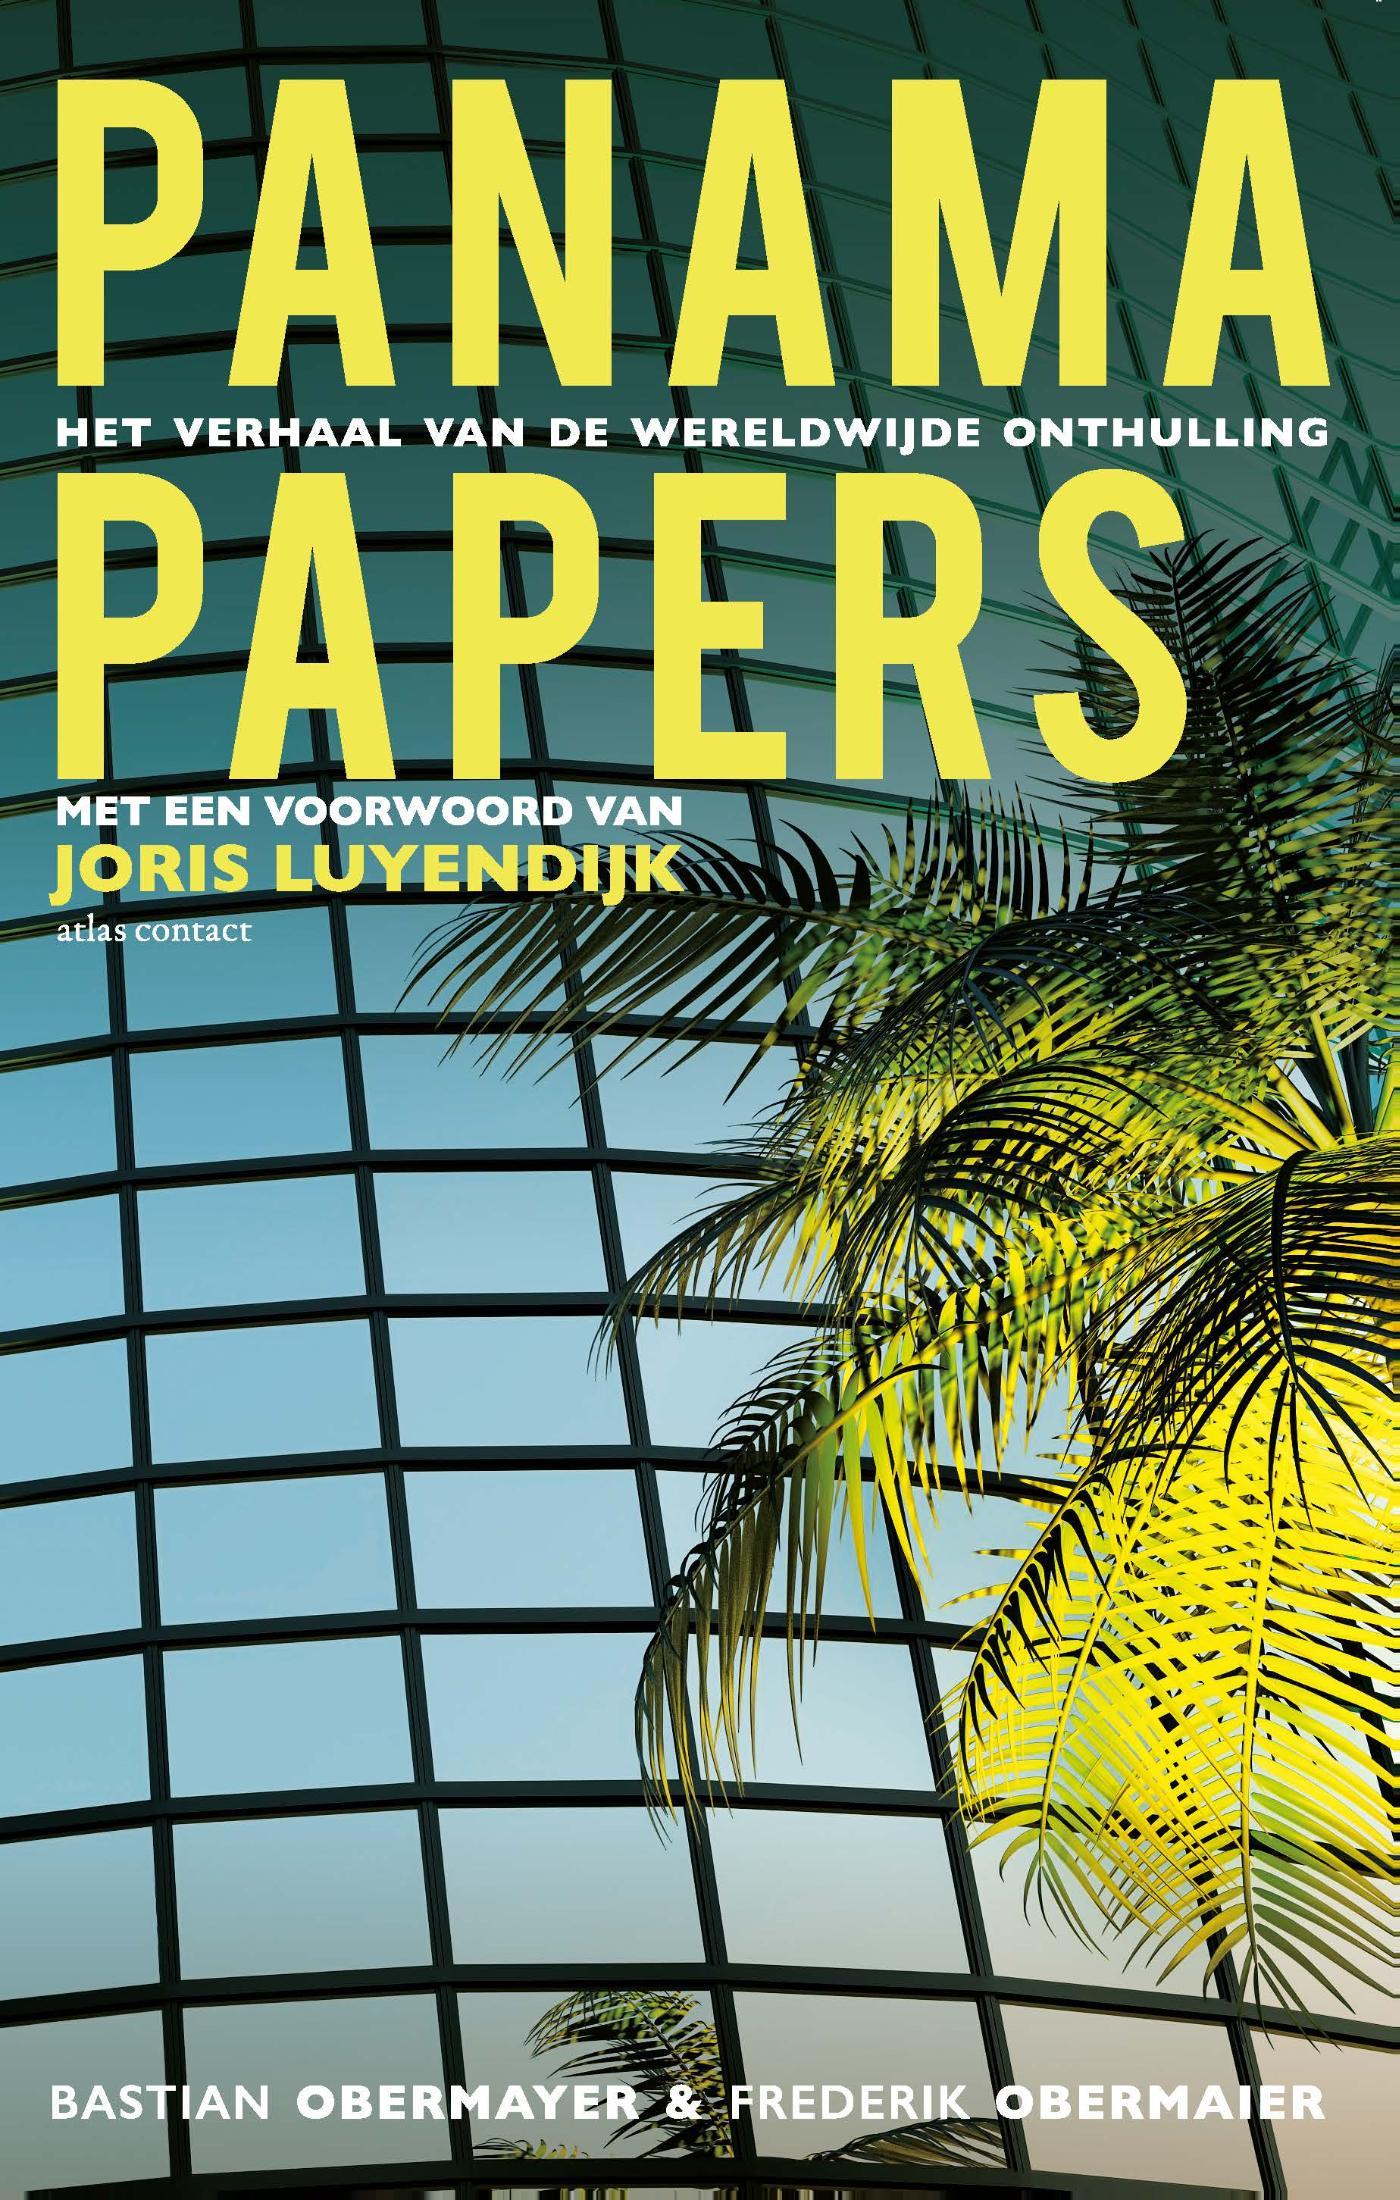 boek panama papers